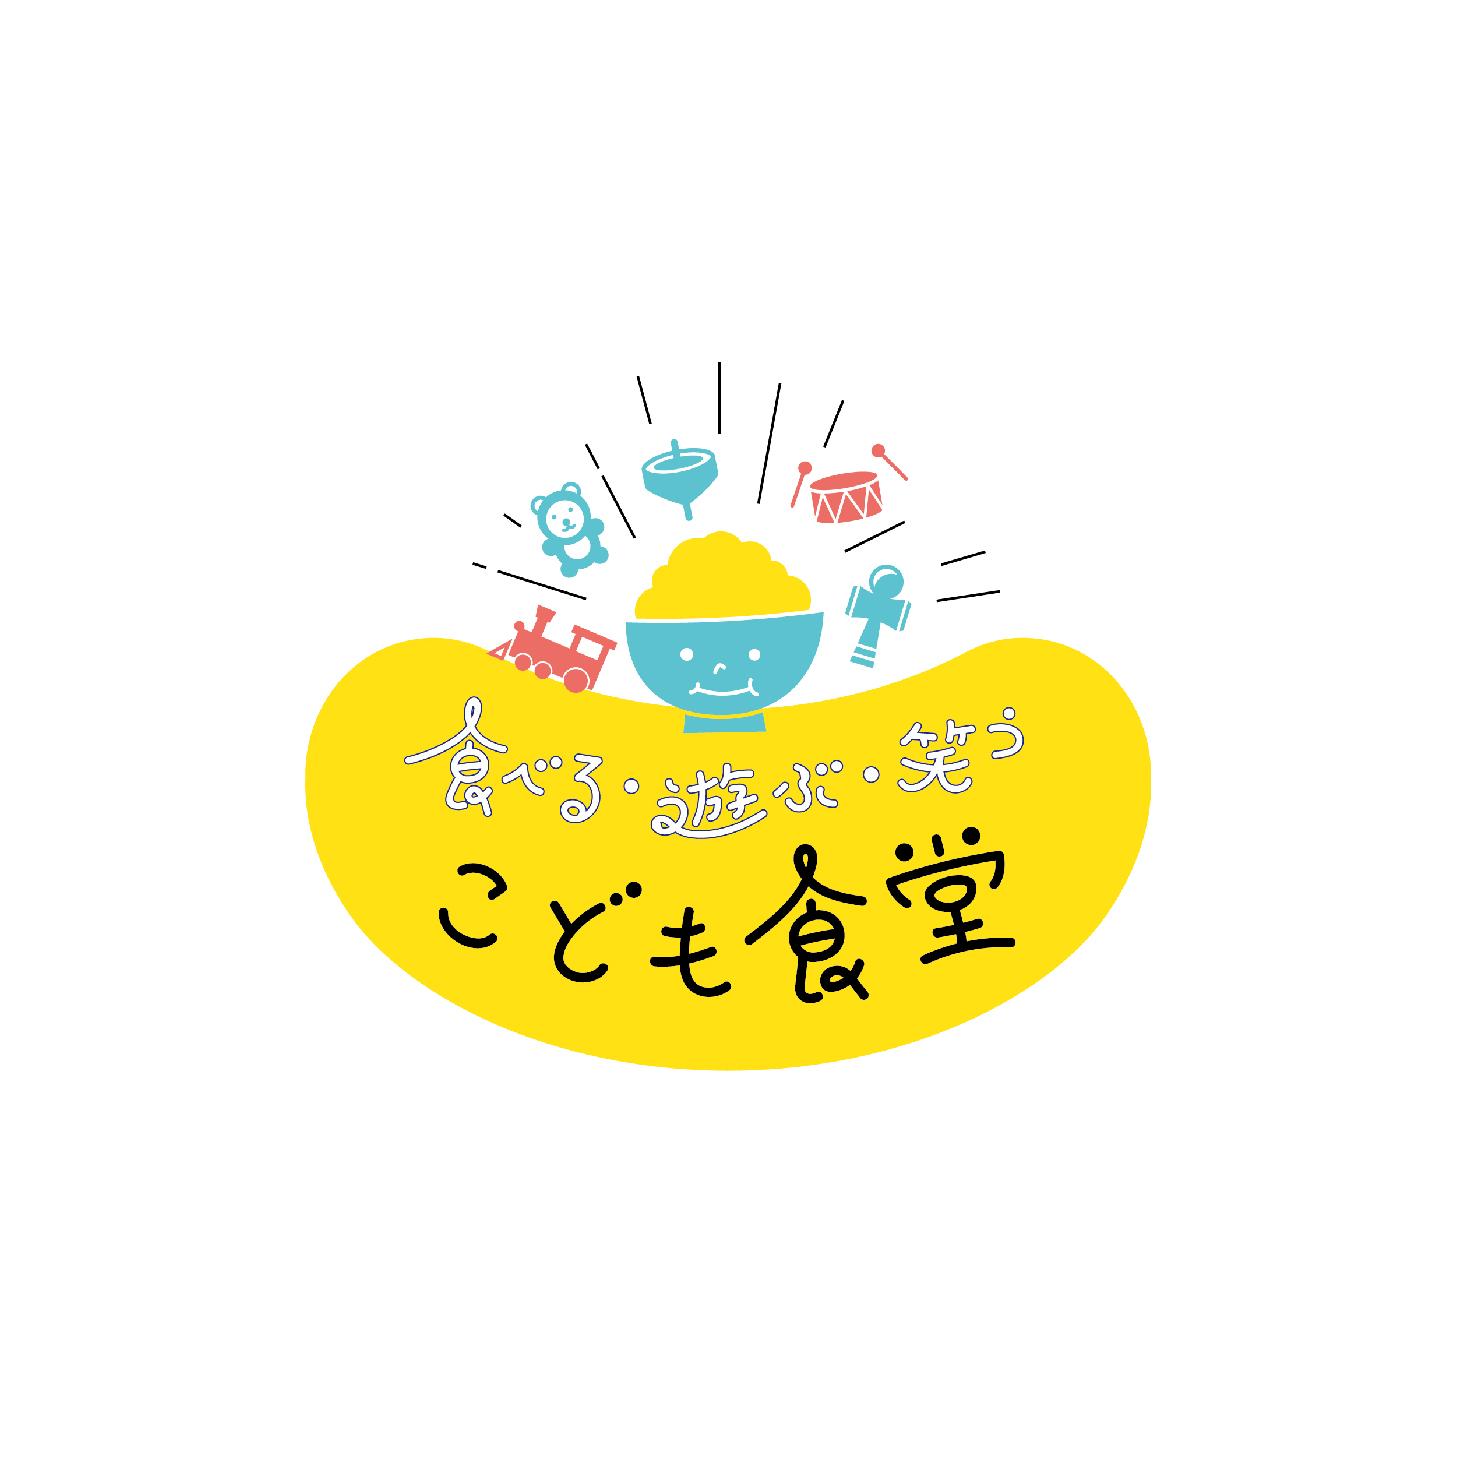 taberu-asobu-warau-kodomosyokudo/ logo